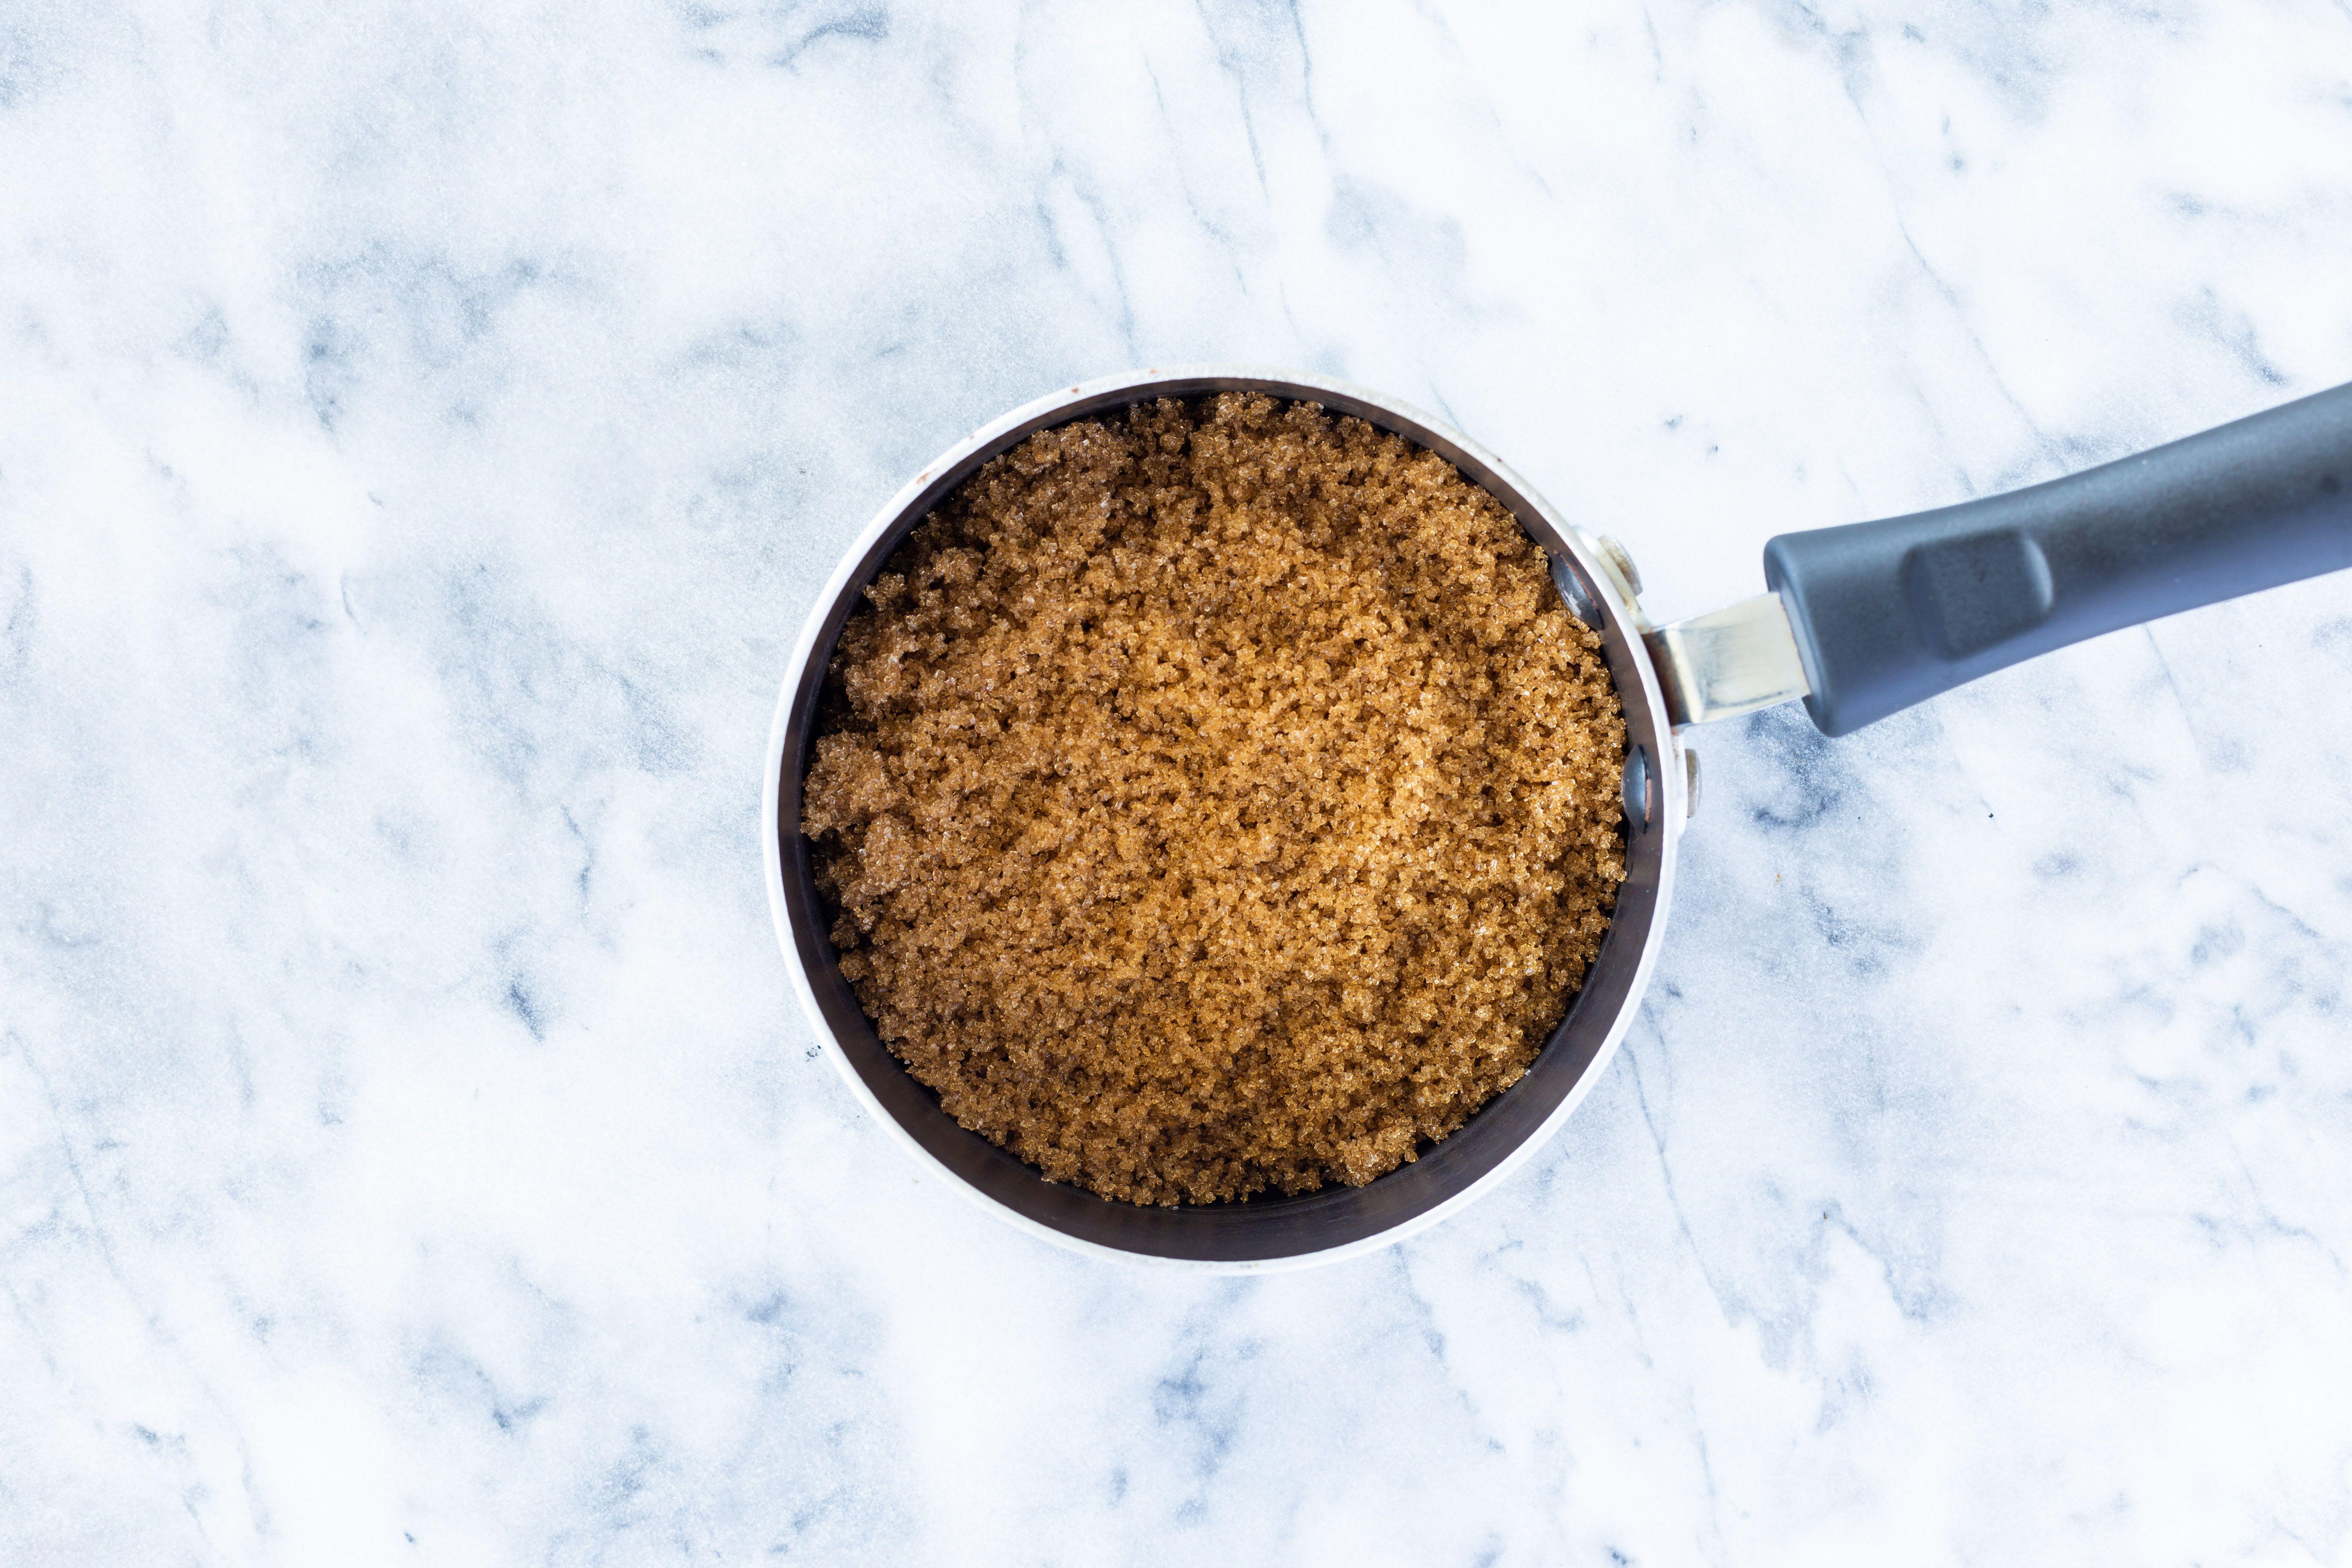 Brown sugar in a saucepan